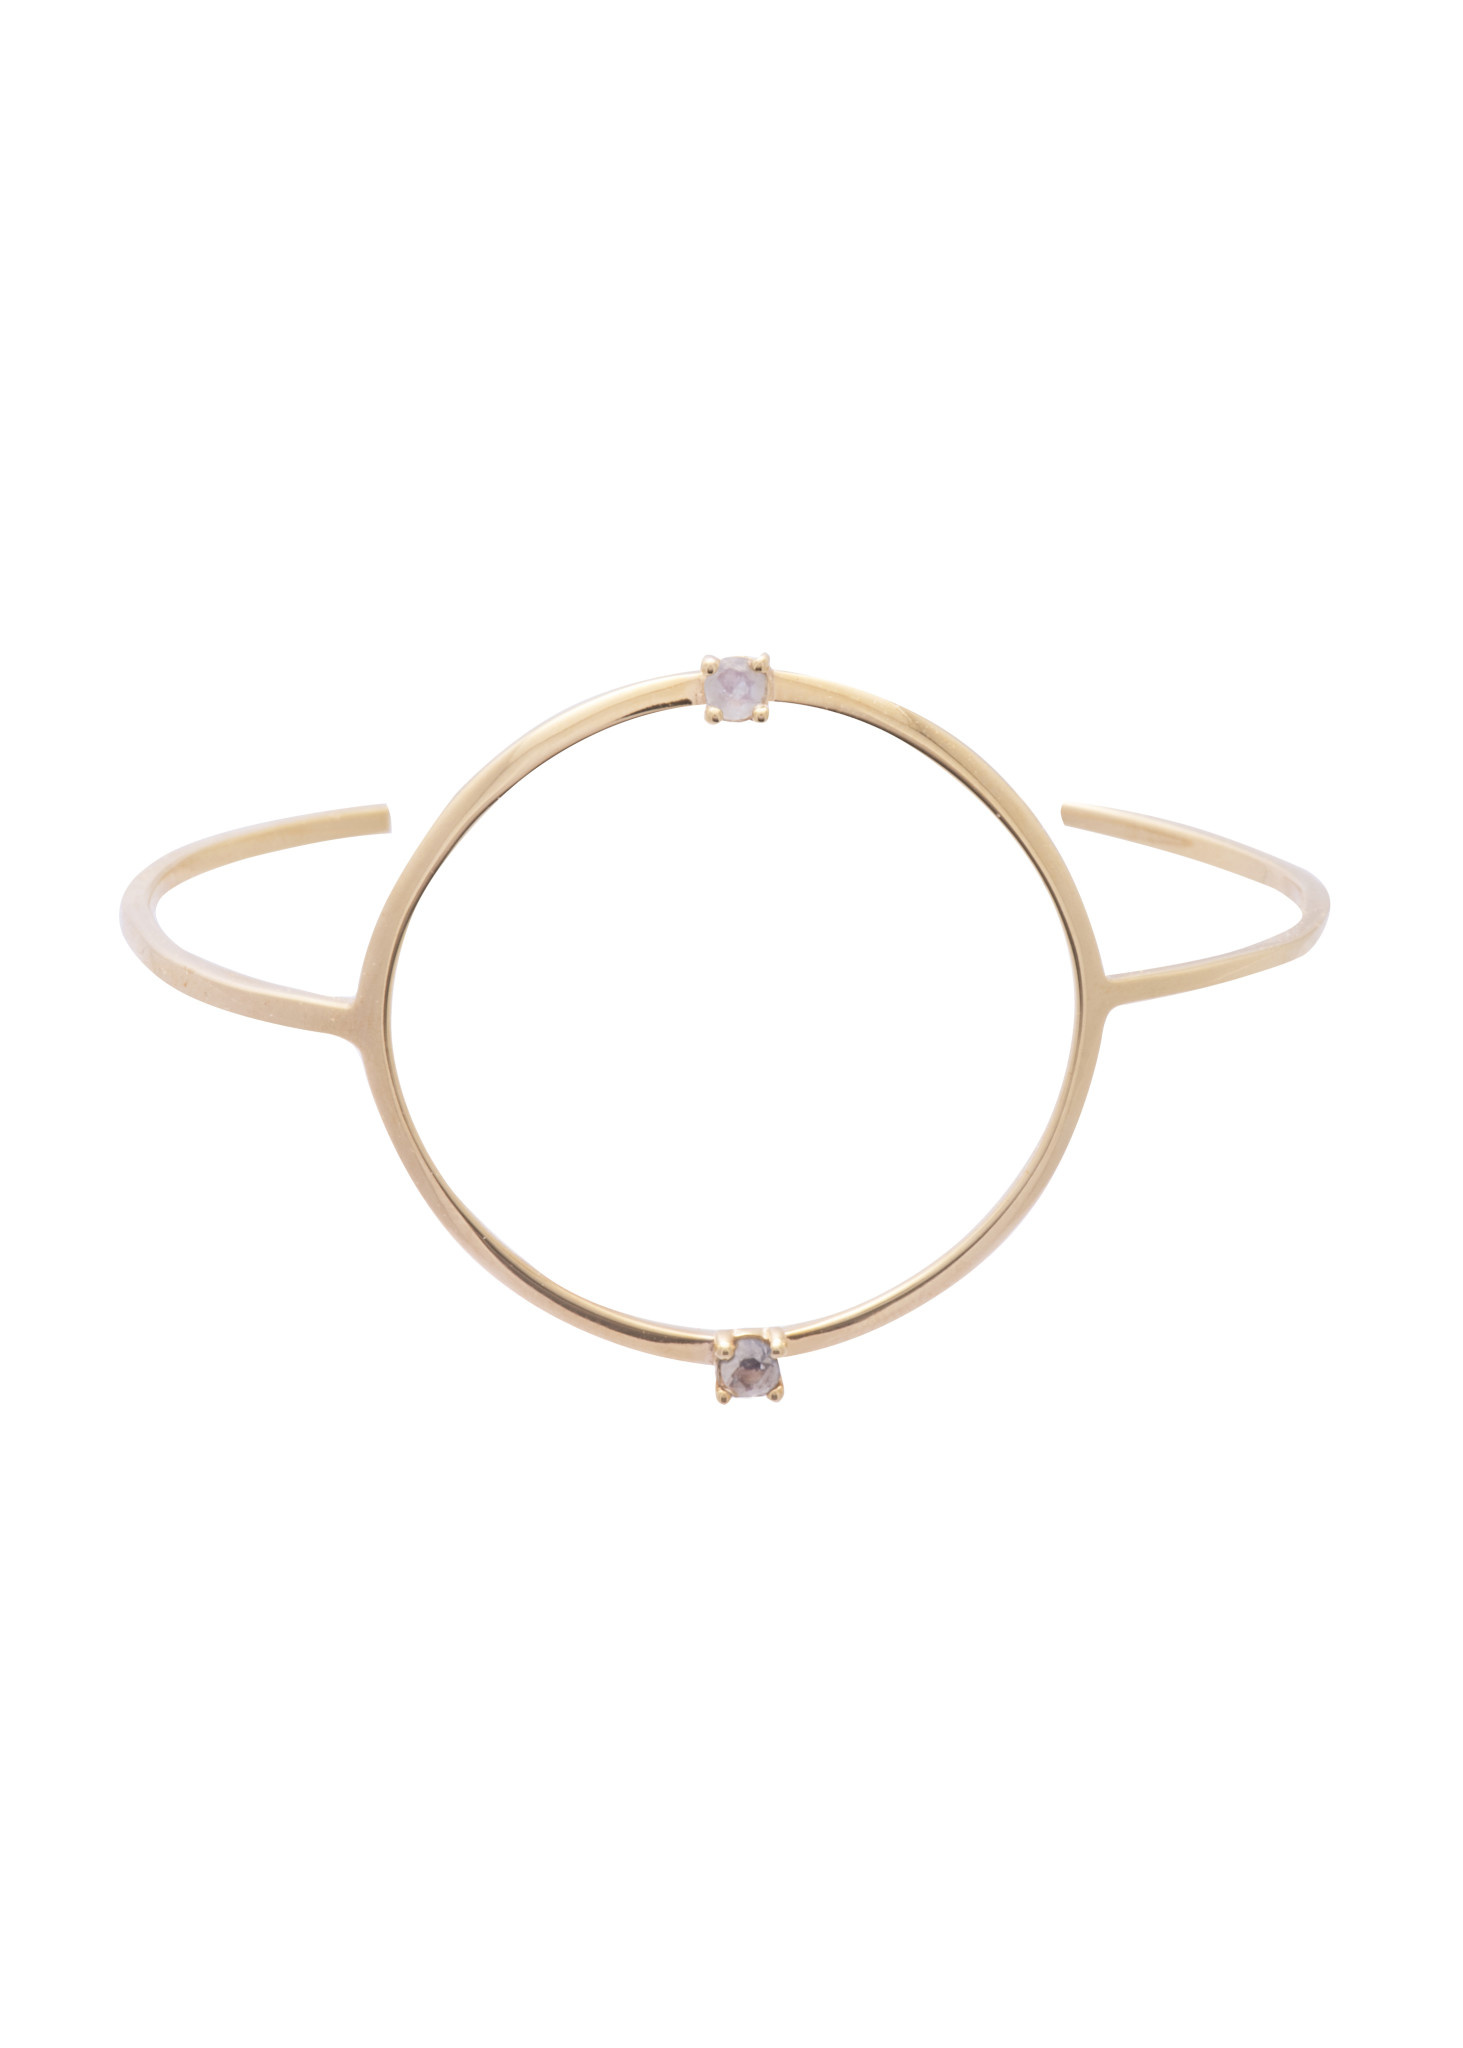 Sarah Mulder Jewelry Sarah Mulder Jewelry - Pulse Cuff Labradorite